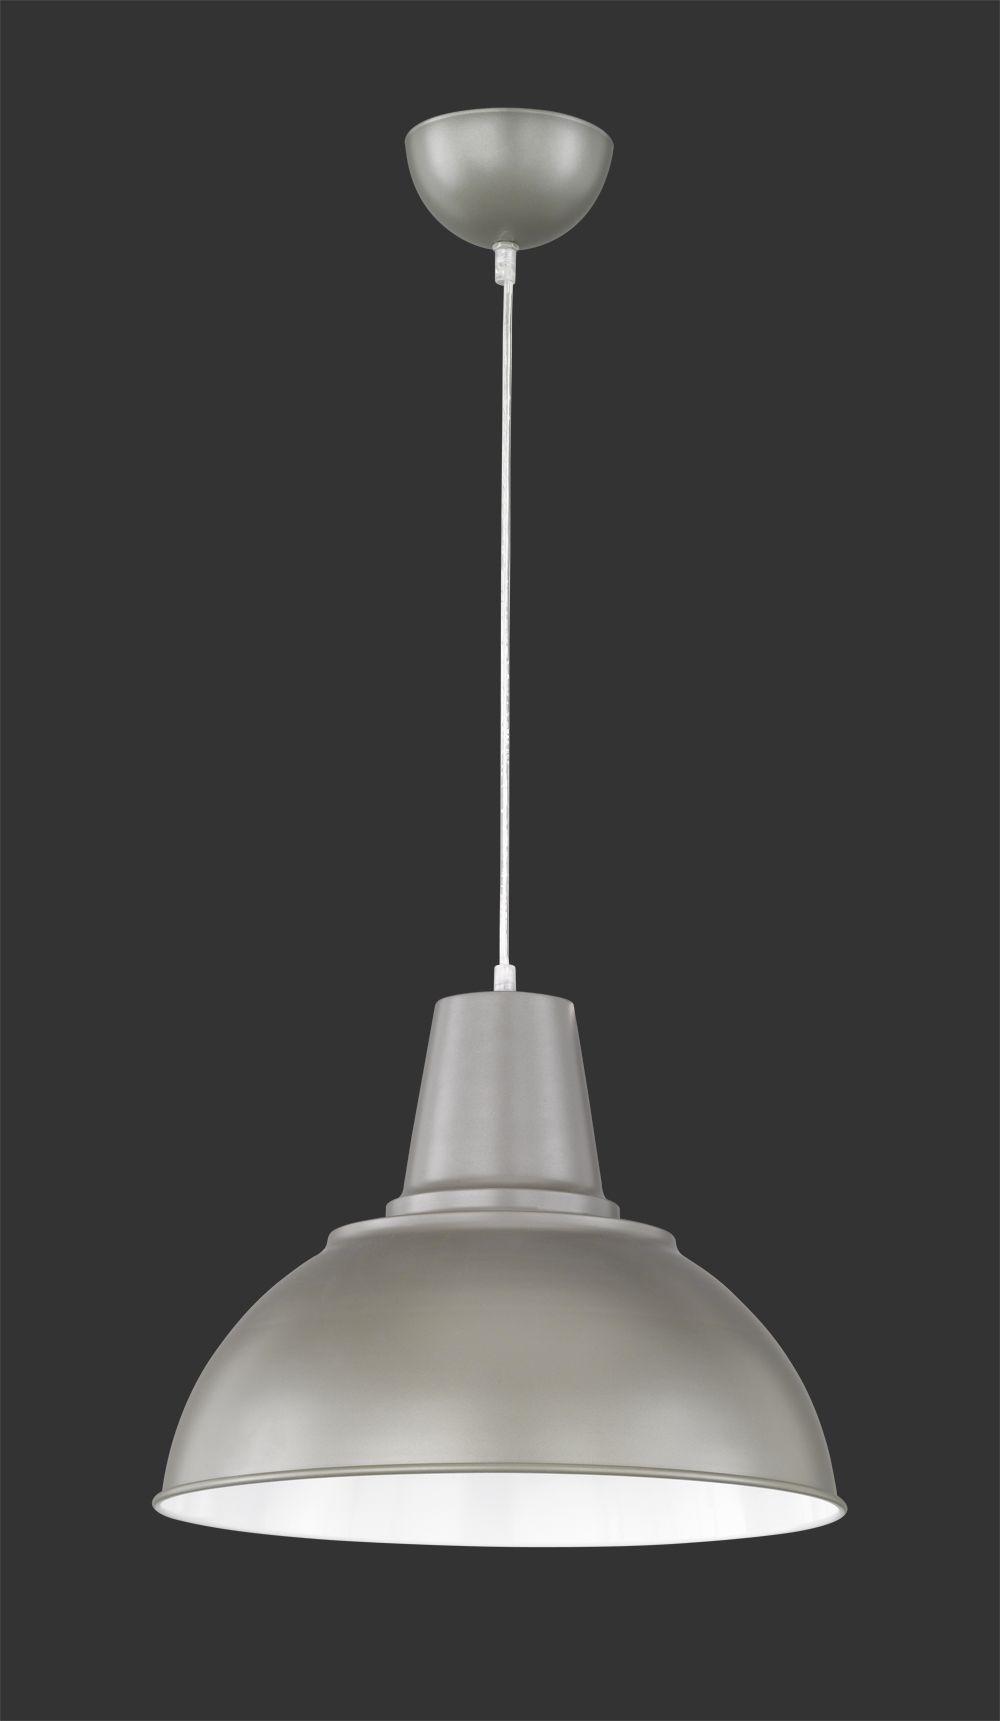 Reality Pendel Iowa R30431042 Ceiling Lights Pendant Light Light